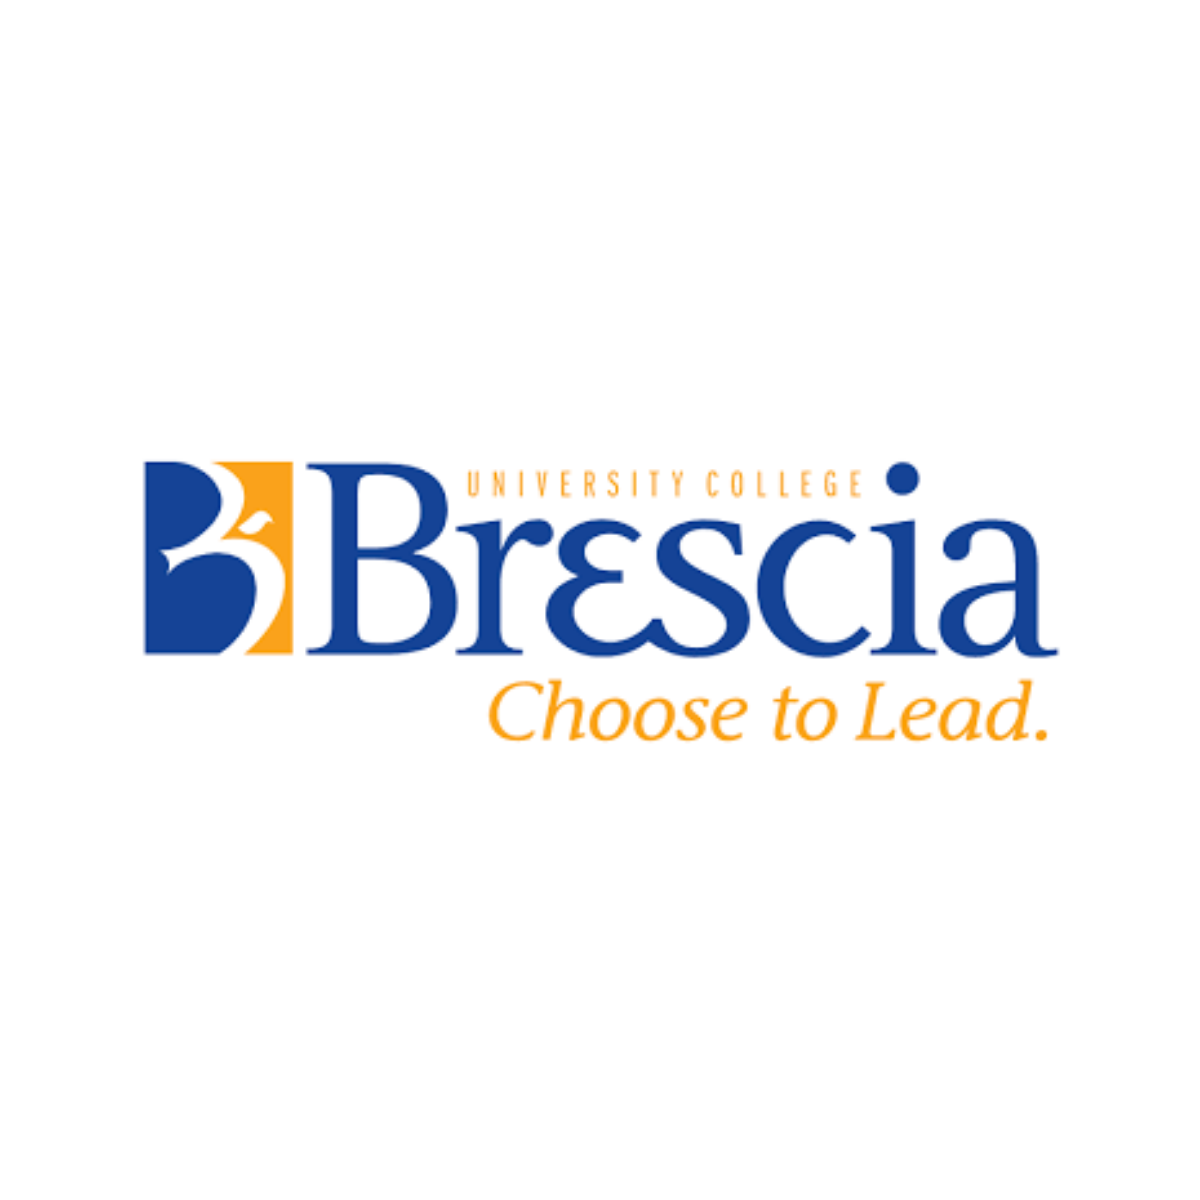 Brescia University College Logo Image